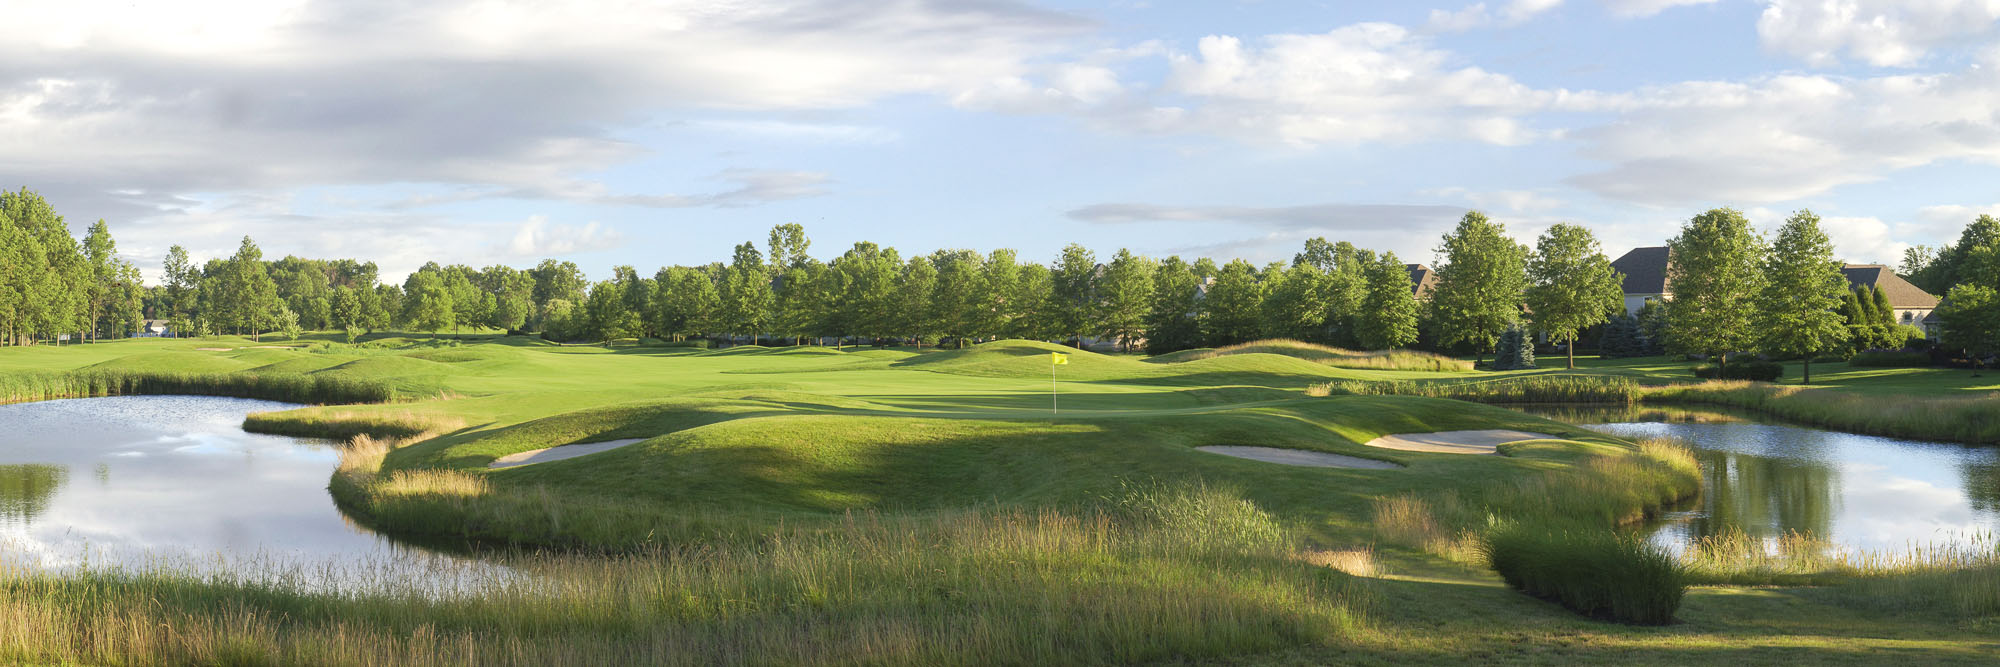 Golf Course Image - Jefferson Country Club No. 1